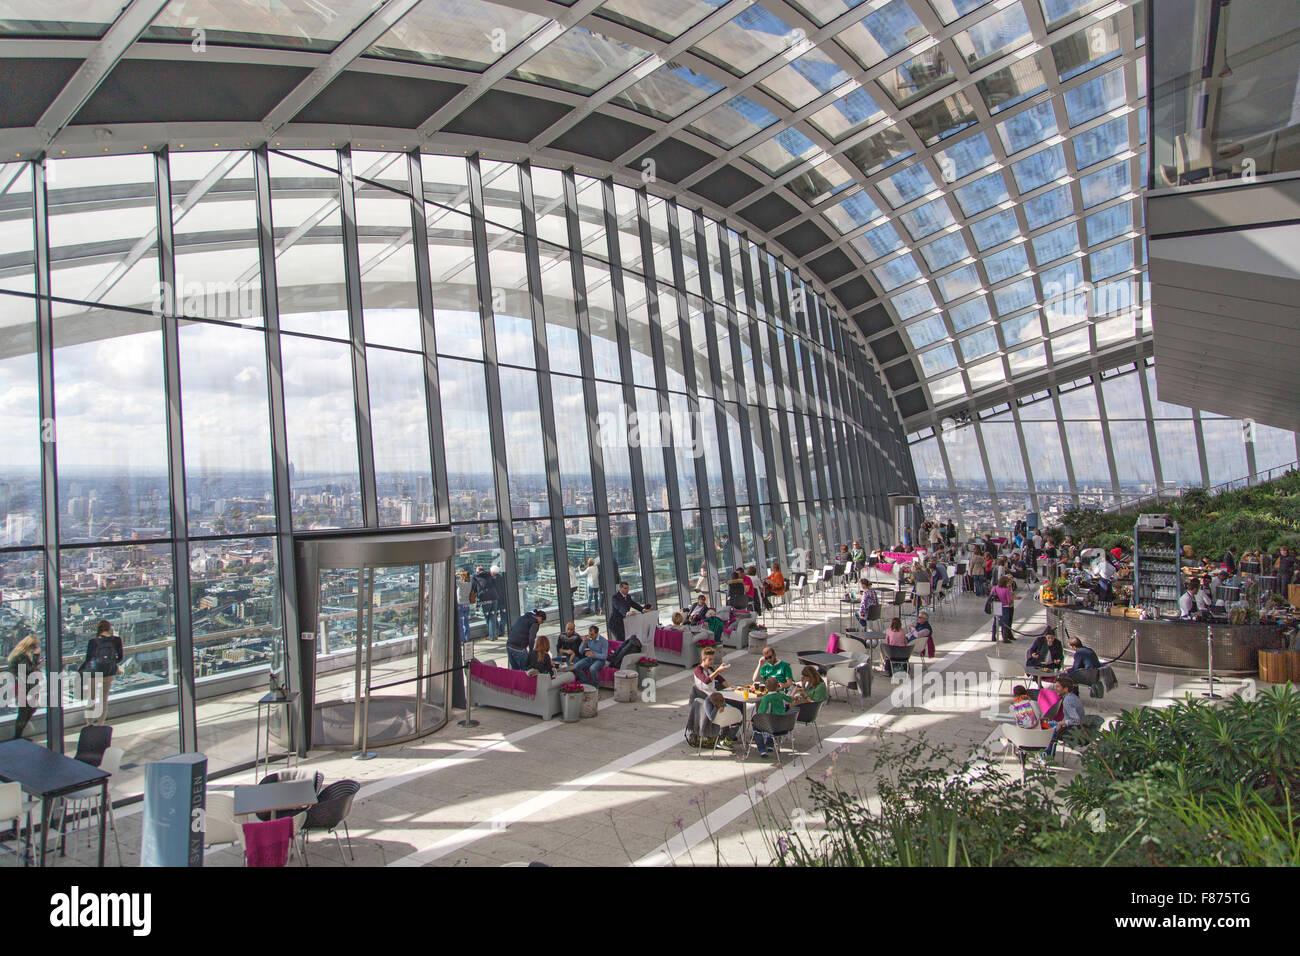 Skygarden in London's Walkie Talkie Building - Stock Image